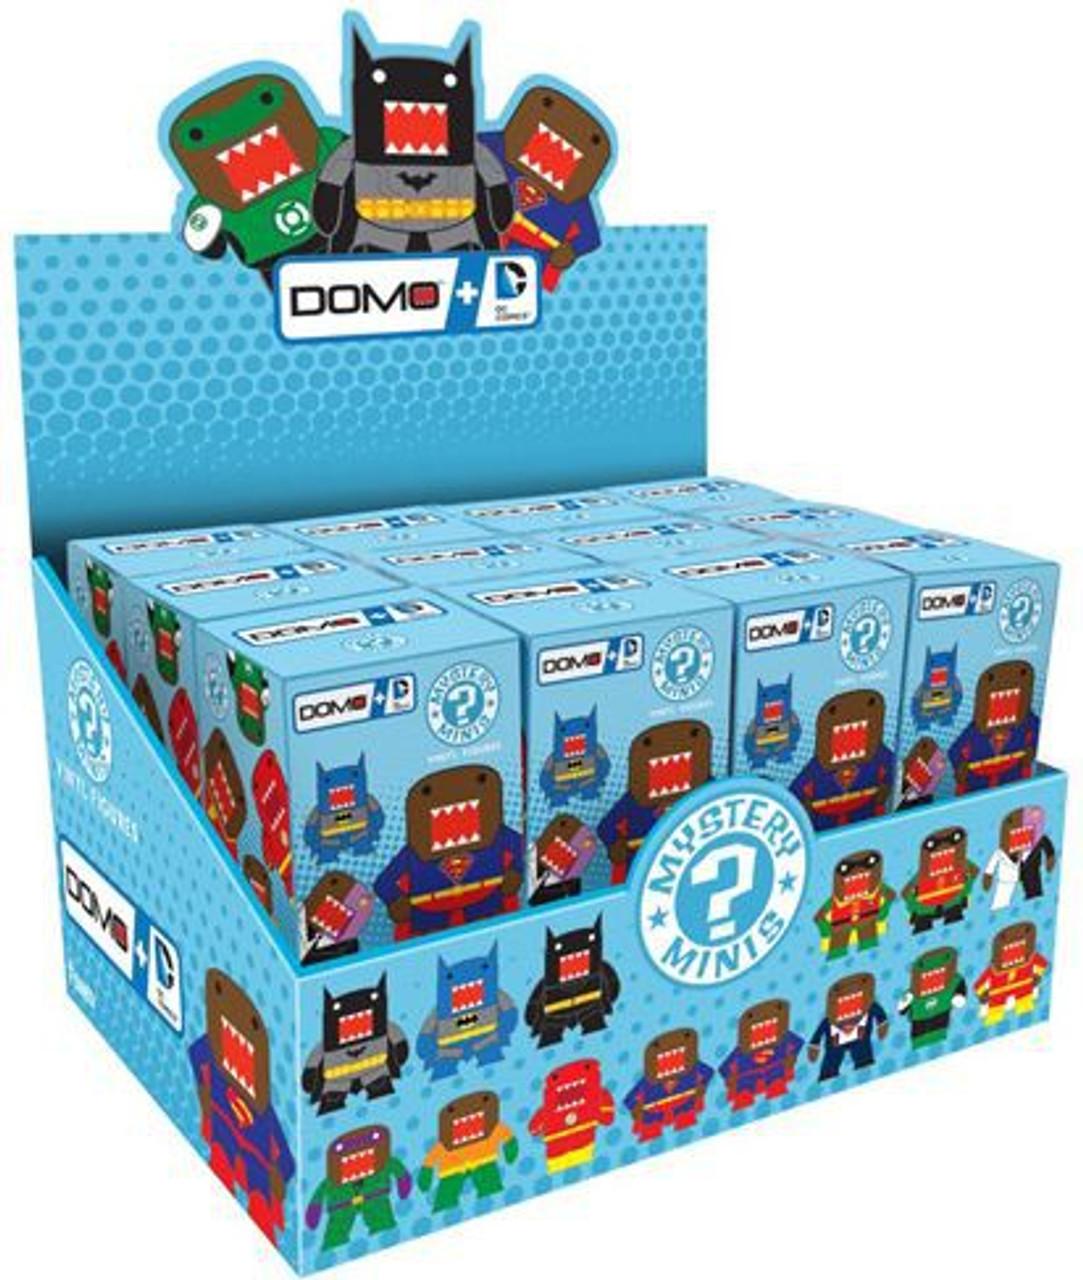 Funko Mystery Minis DC Domo Mystery Box [24 Packs]